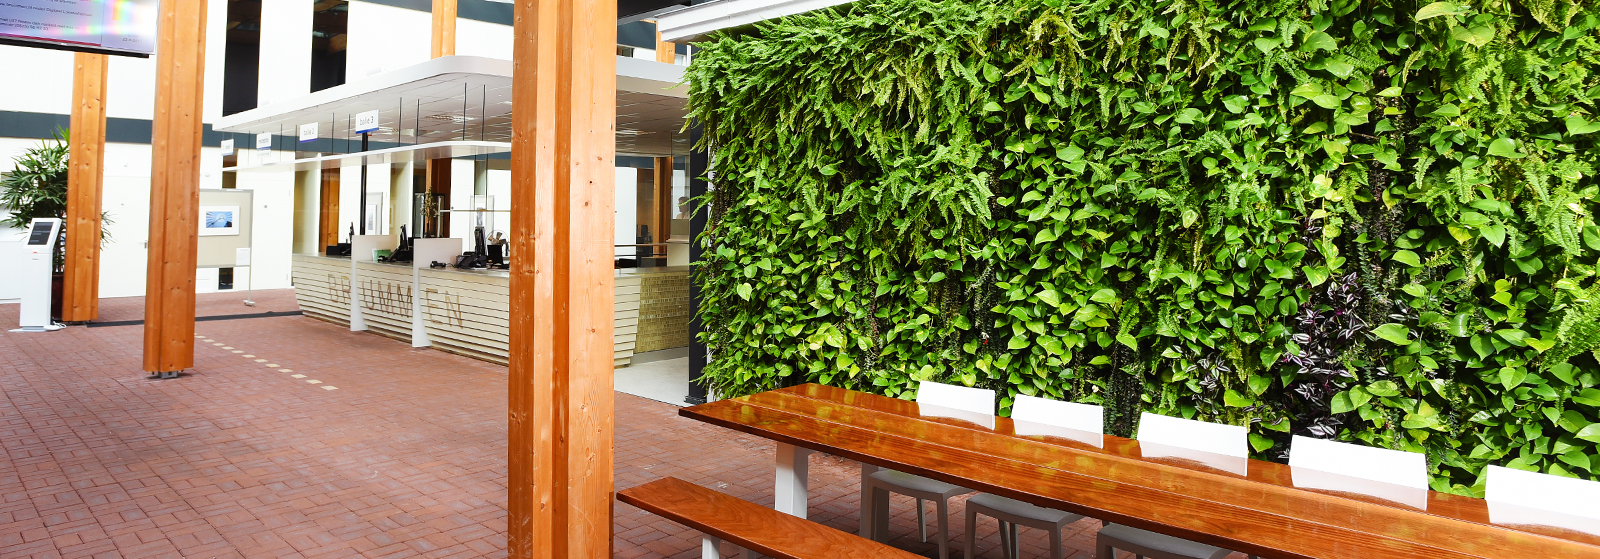 Plantenwand-kantoor.jpg